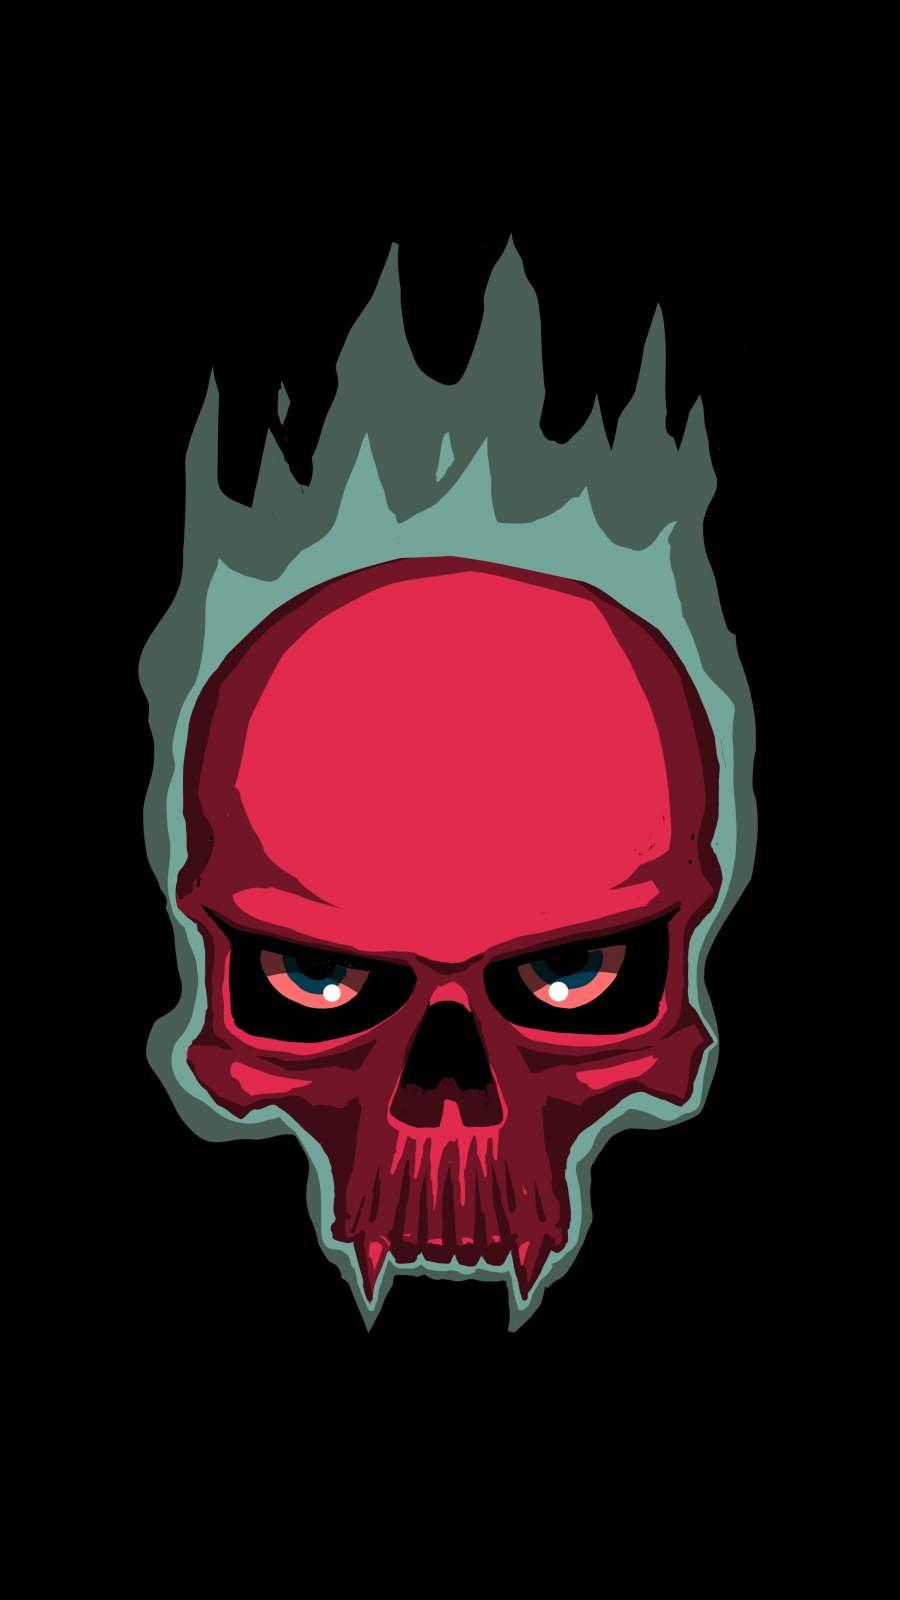 Red Skull iPhone Wallpaper